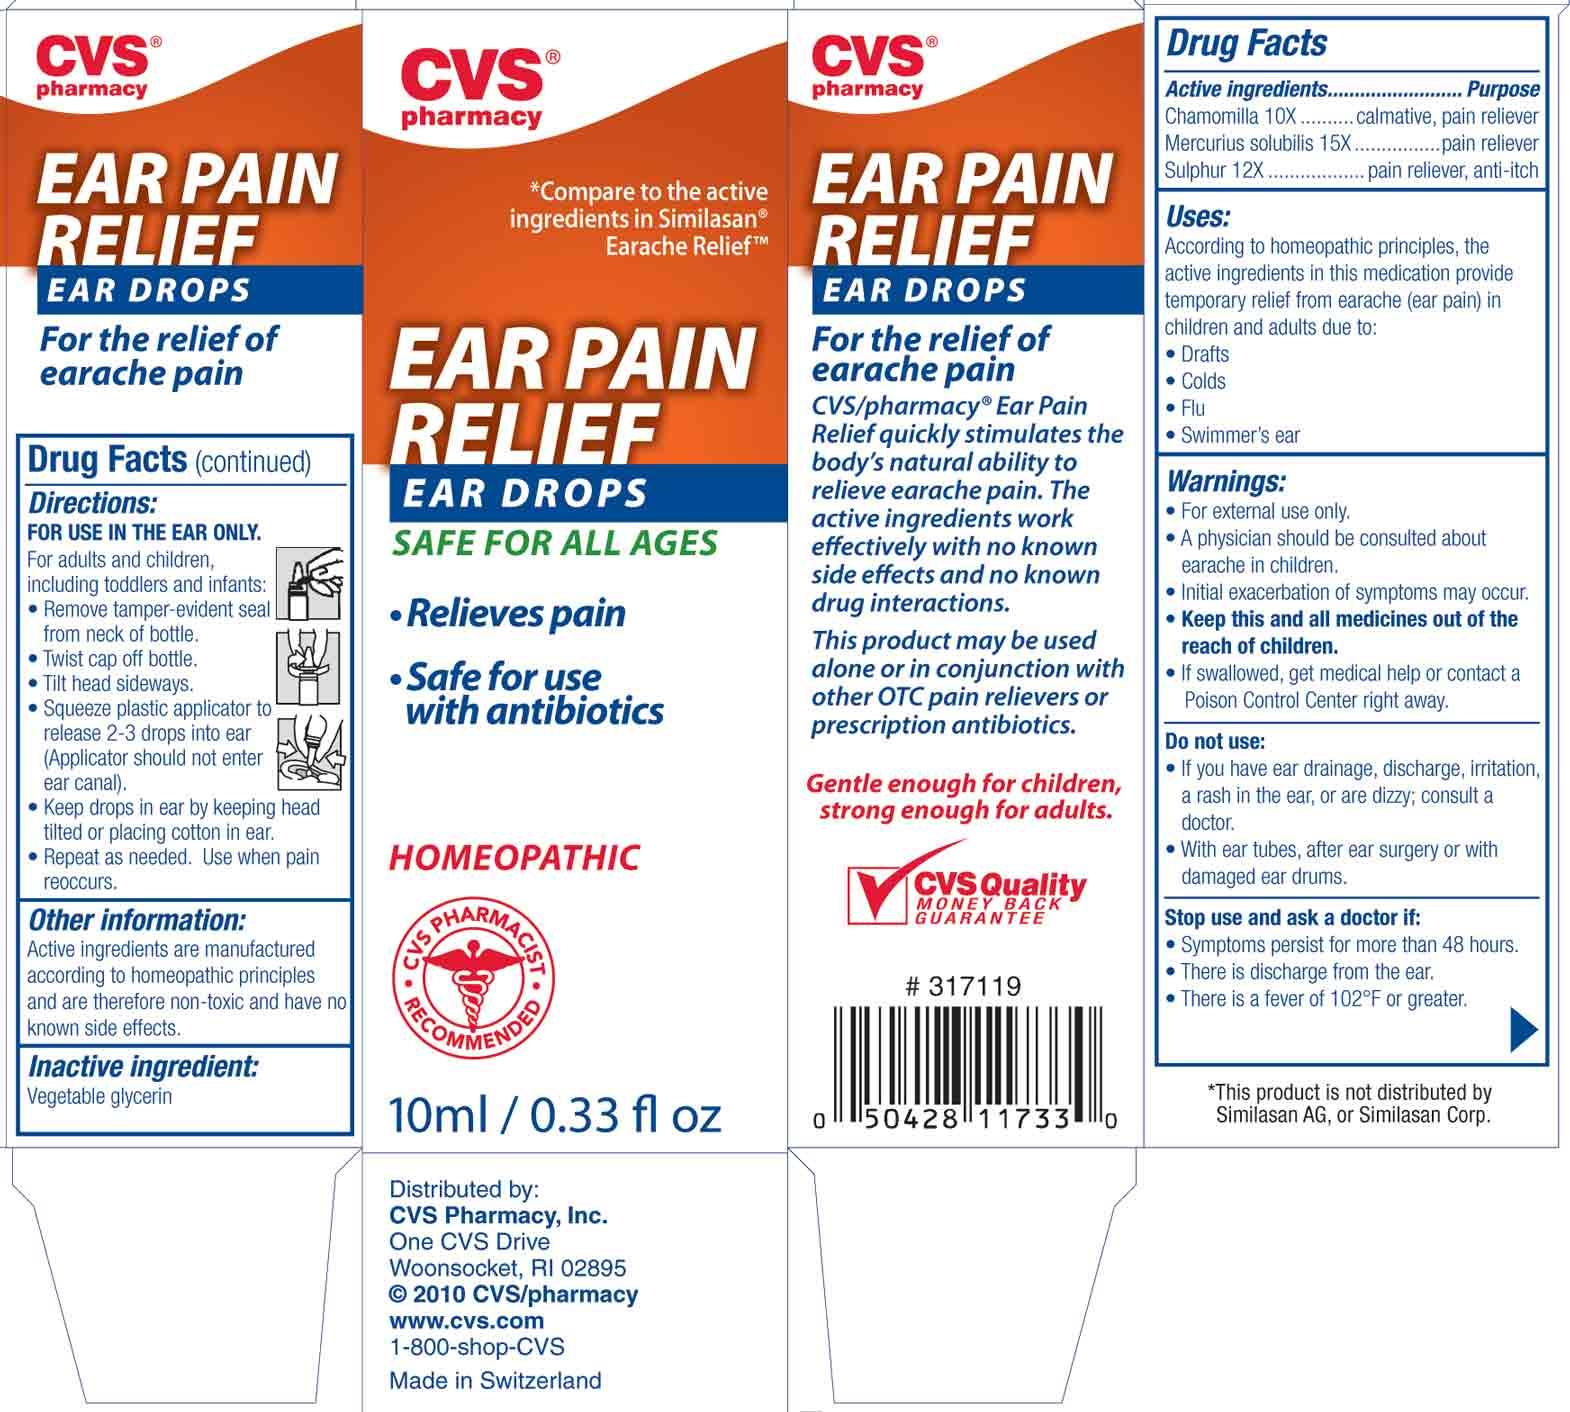 Prescription Drugs Manufactured By Woonsocket Prescription Center